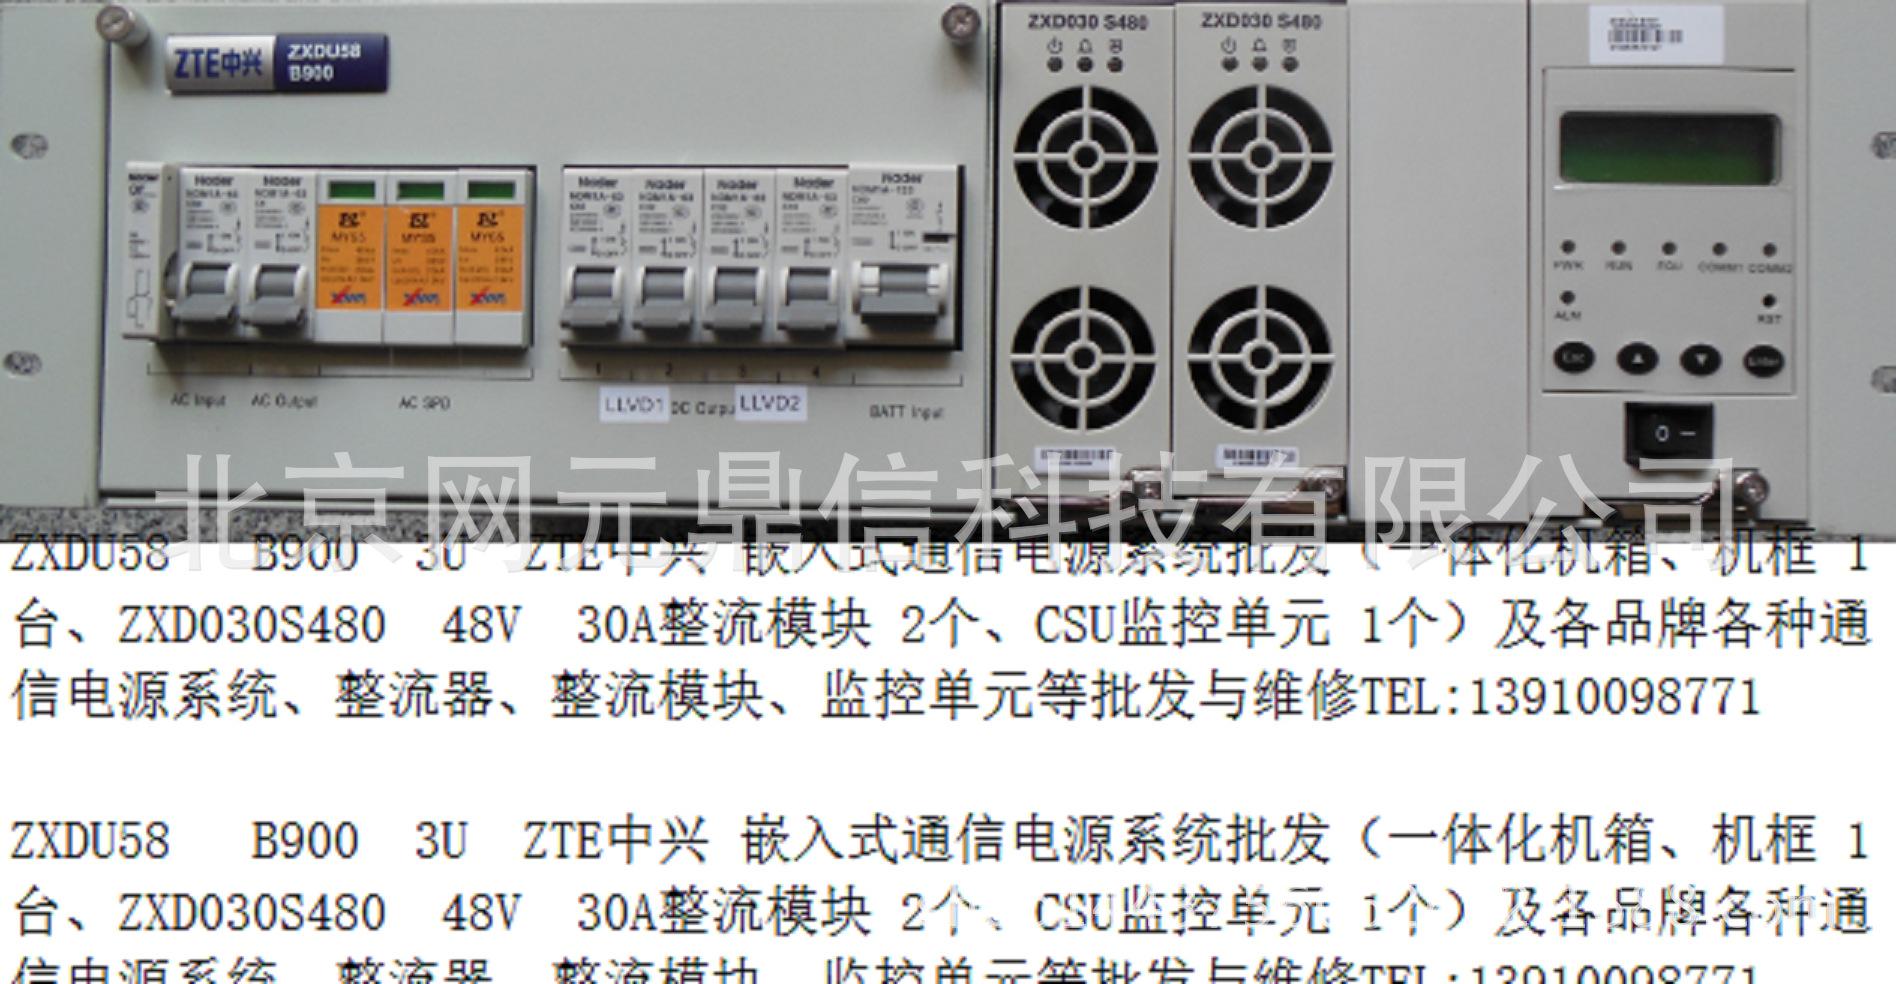 ZXDU58 B900中兴通信电源系统